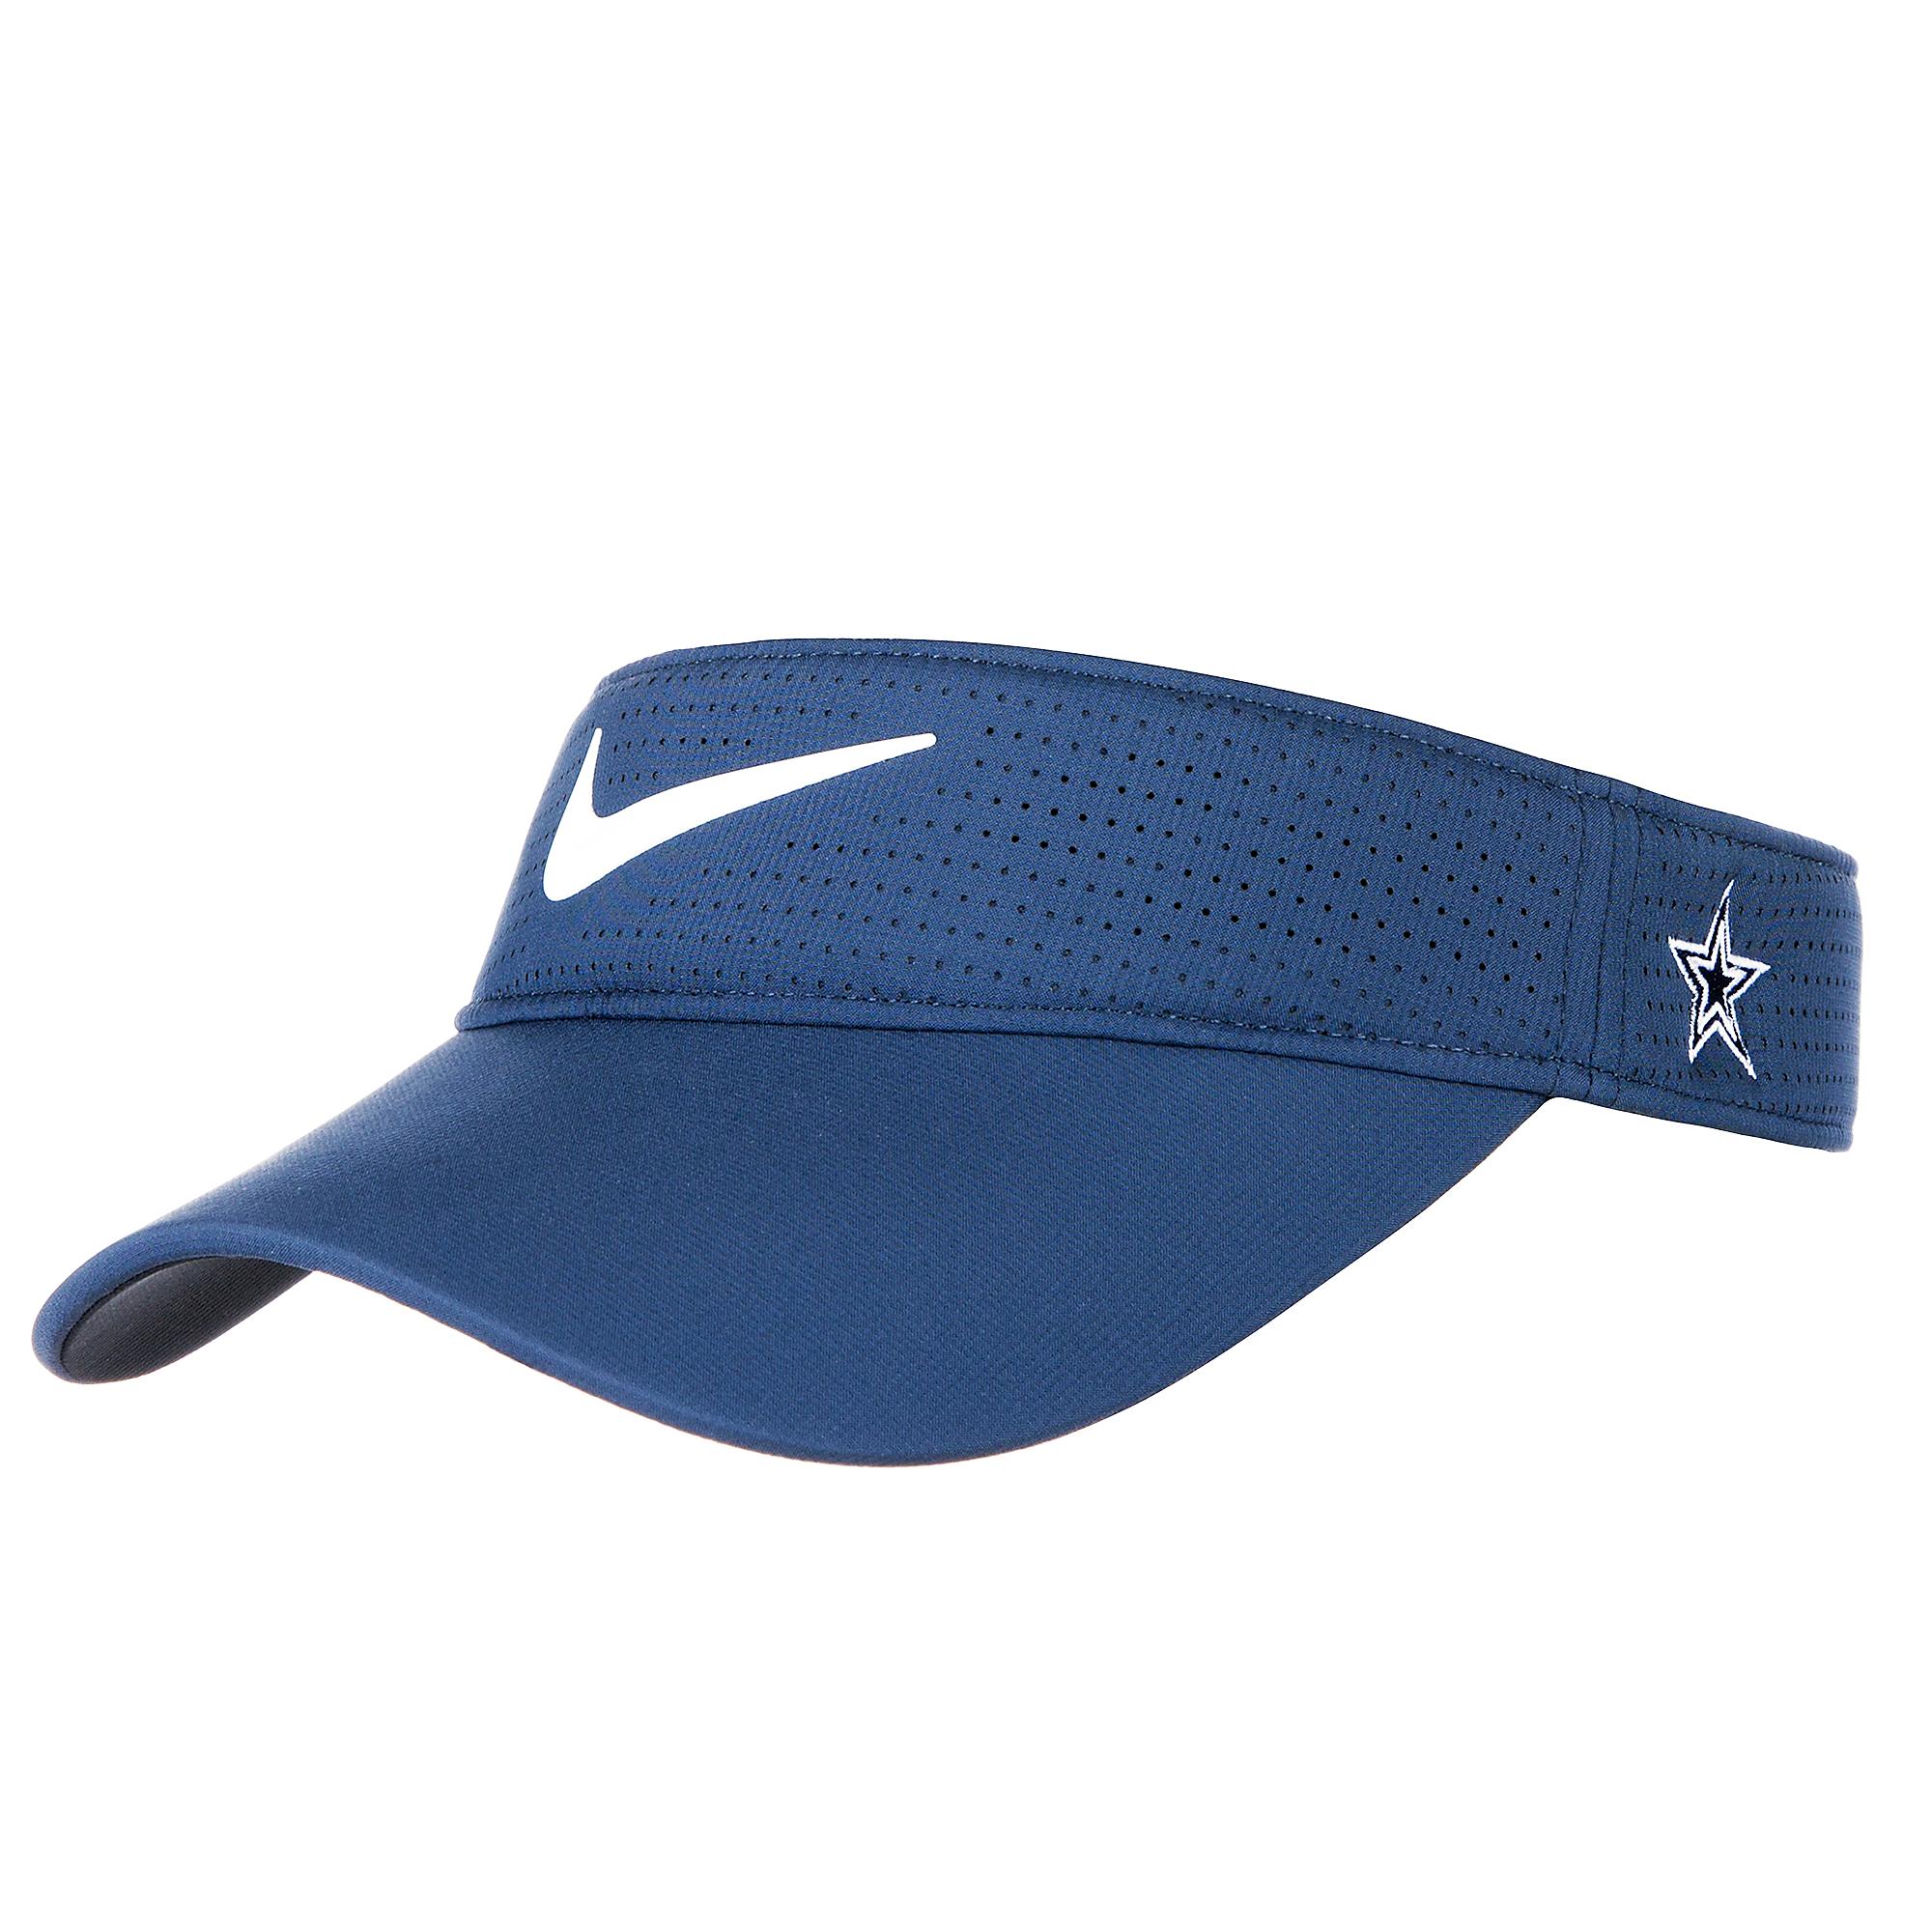 c6b4c65bcae43 ... Dallas Cowboys Womens Nike AeroBill Golf Visor ...